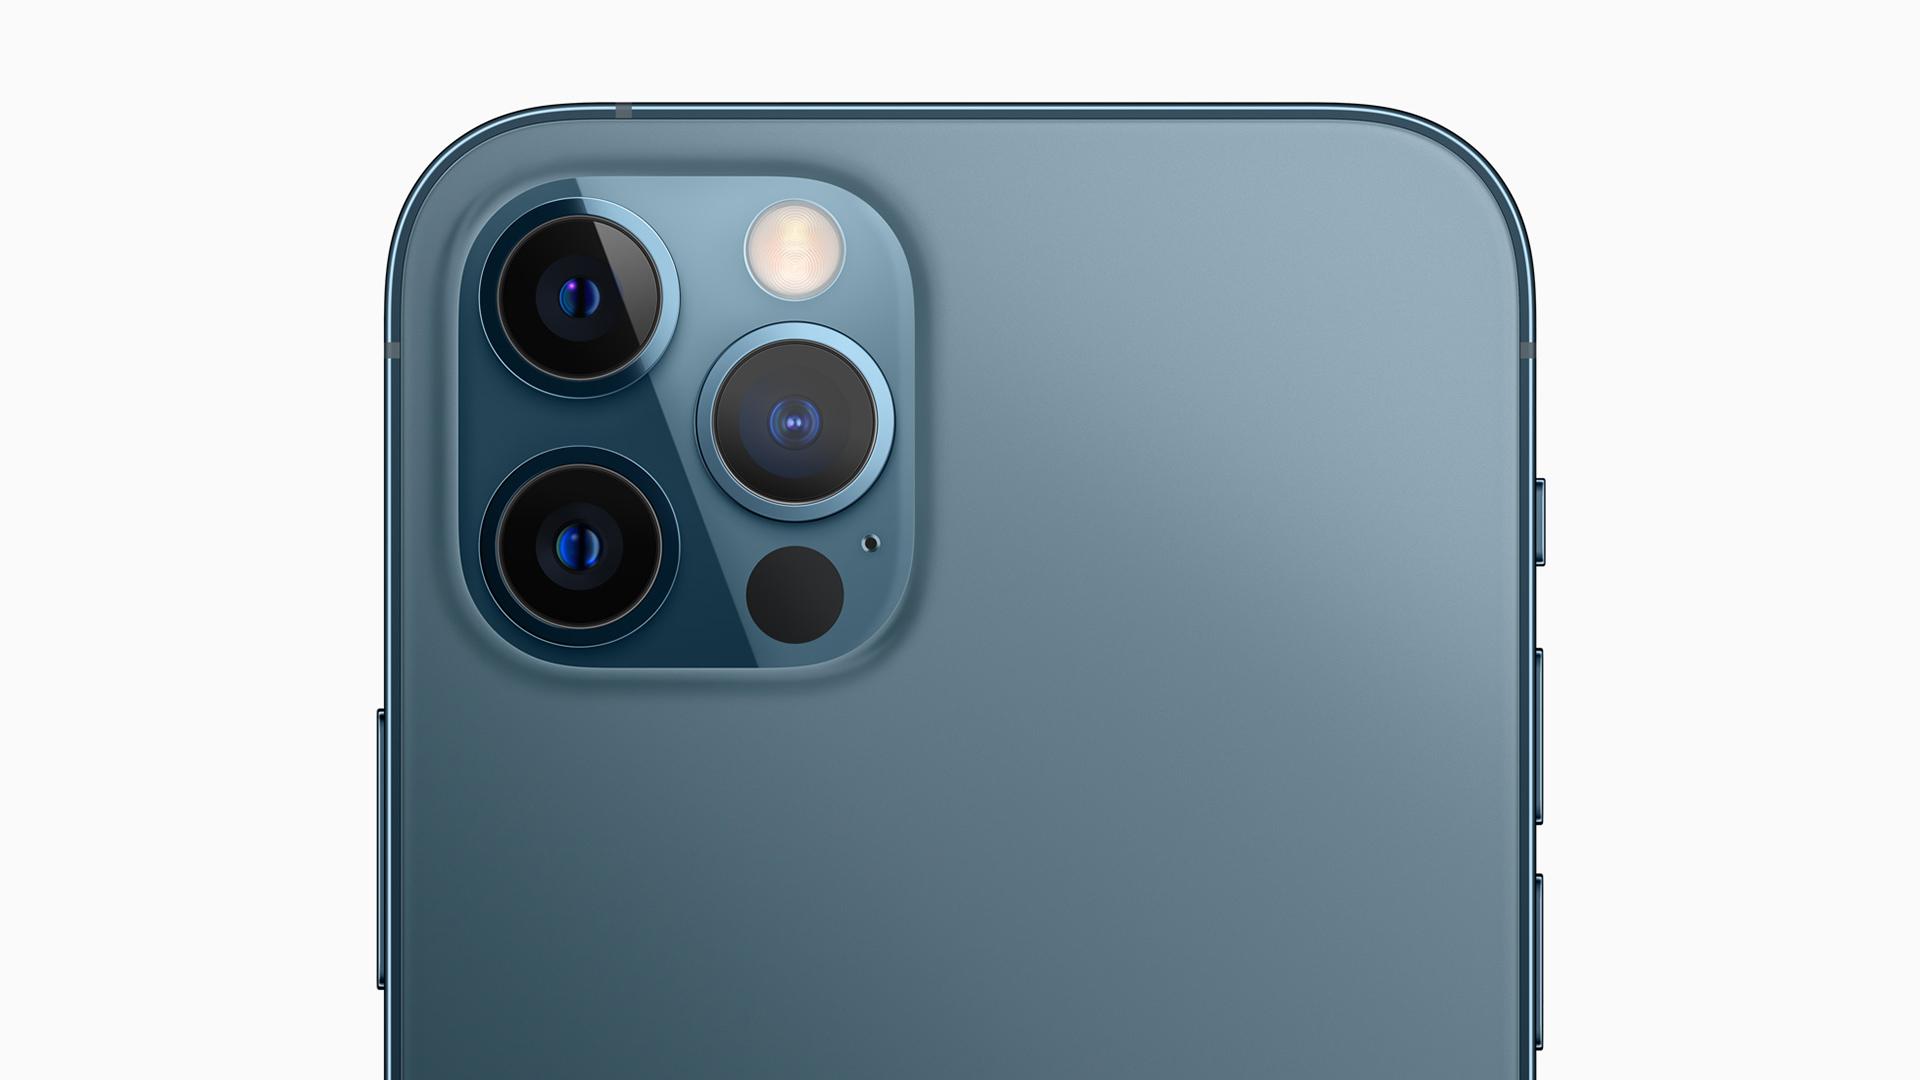 iPhone 12 Pro Max. Image: Apple.